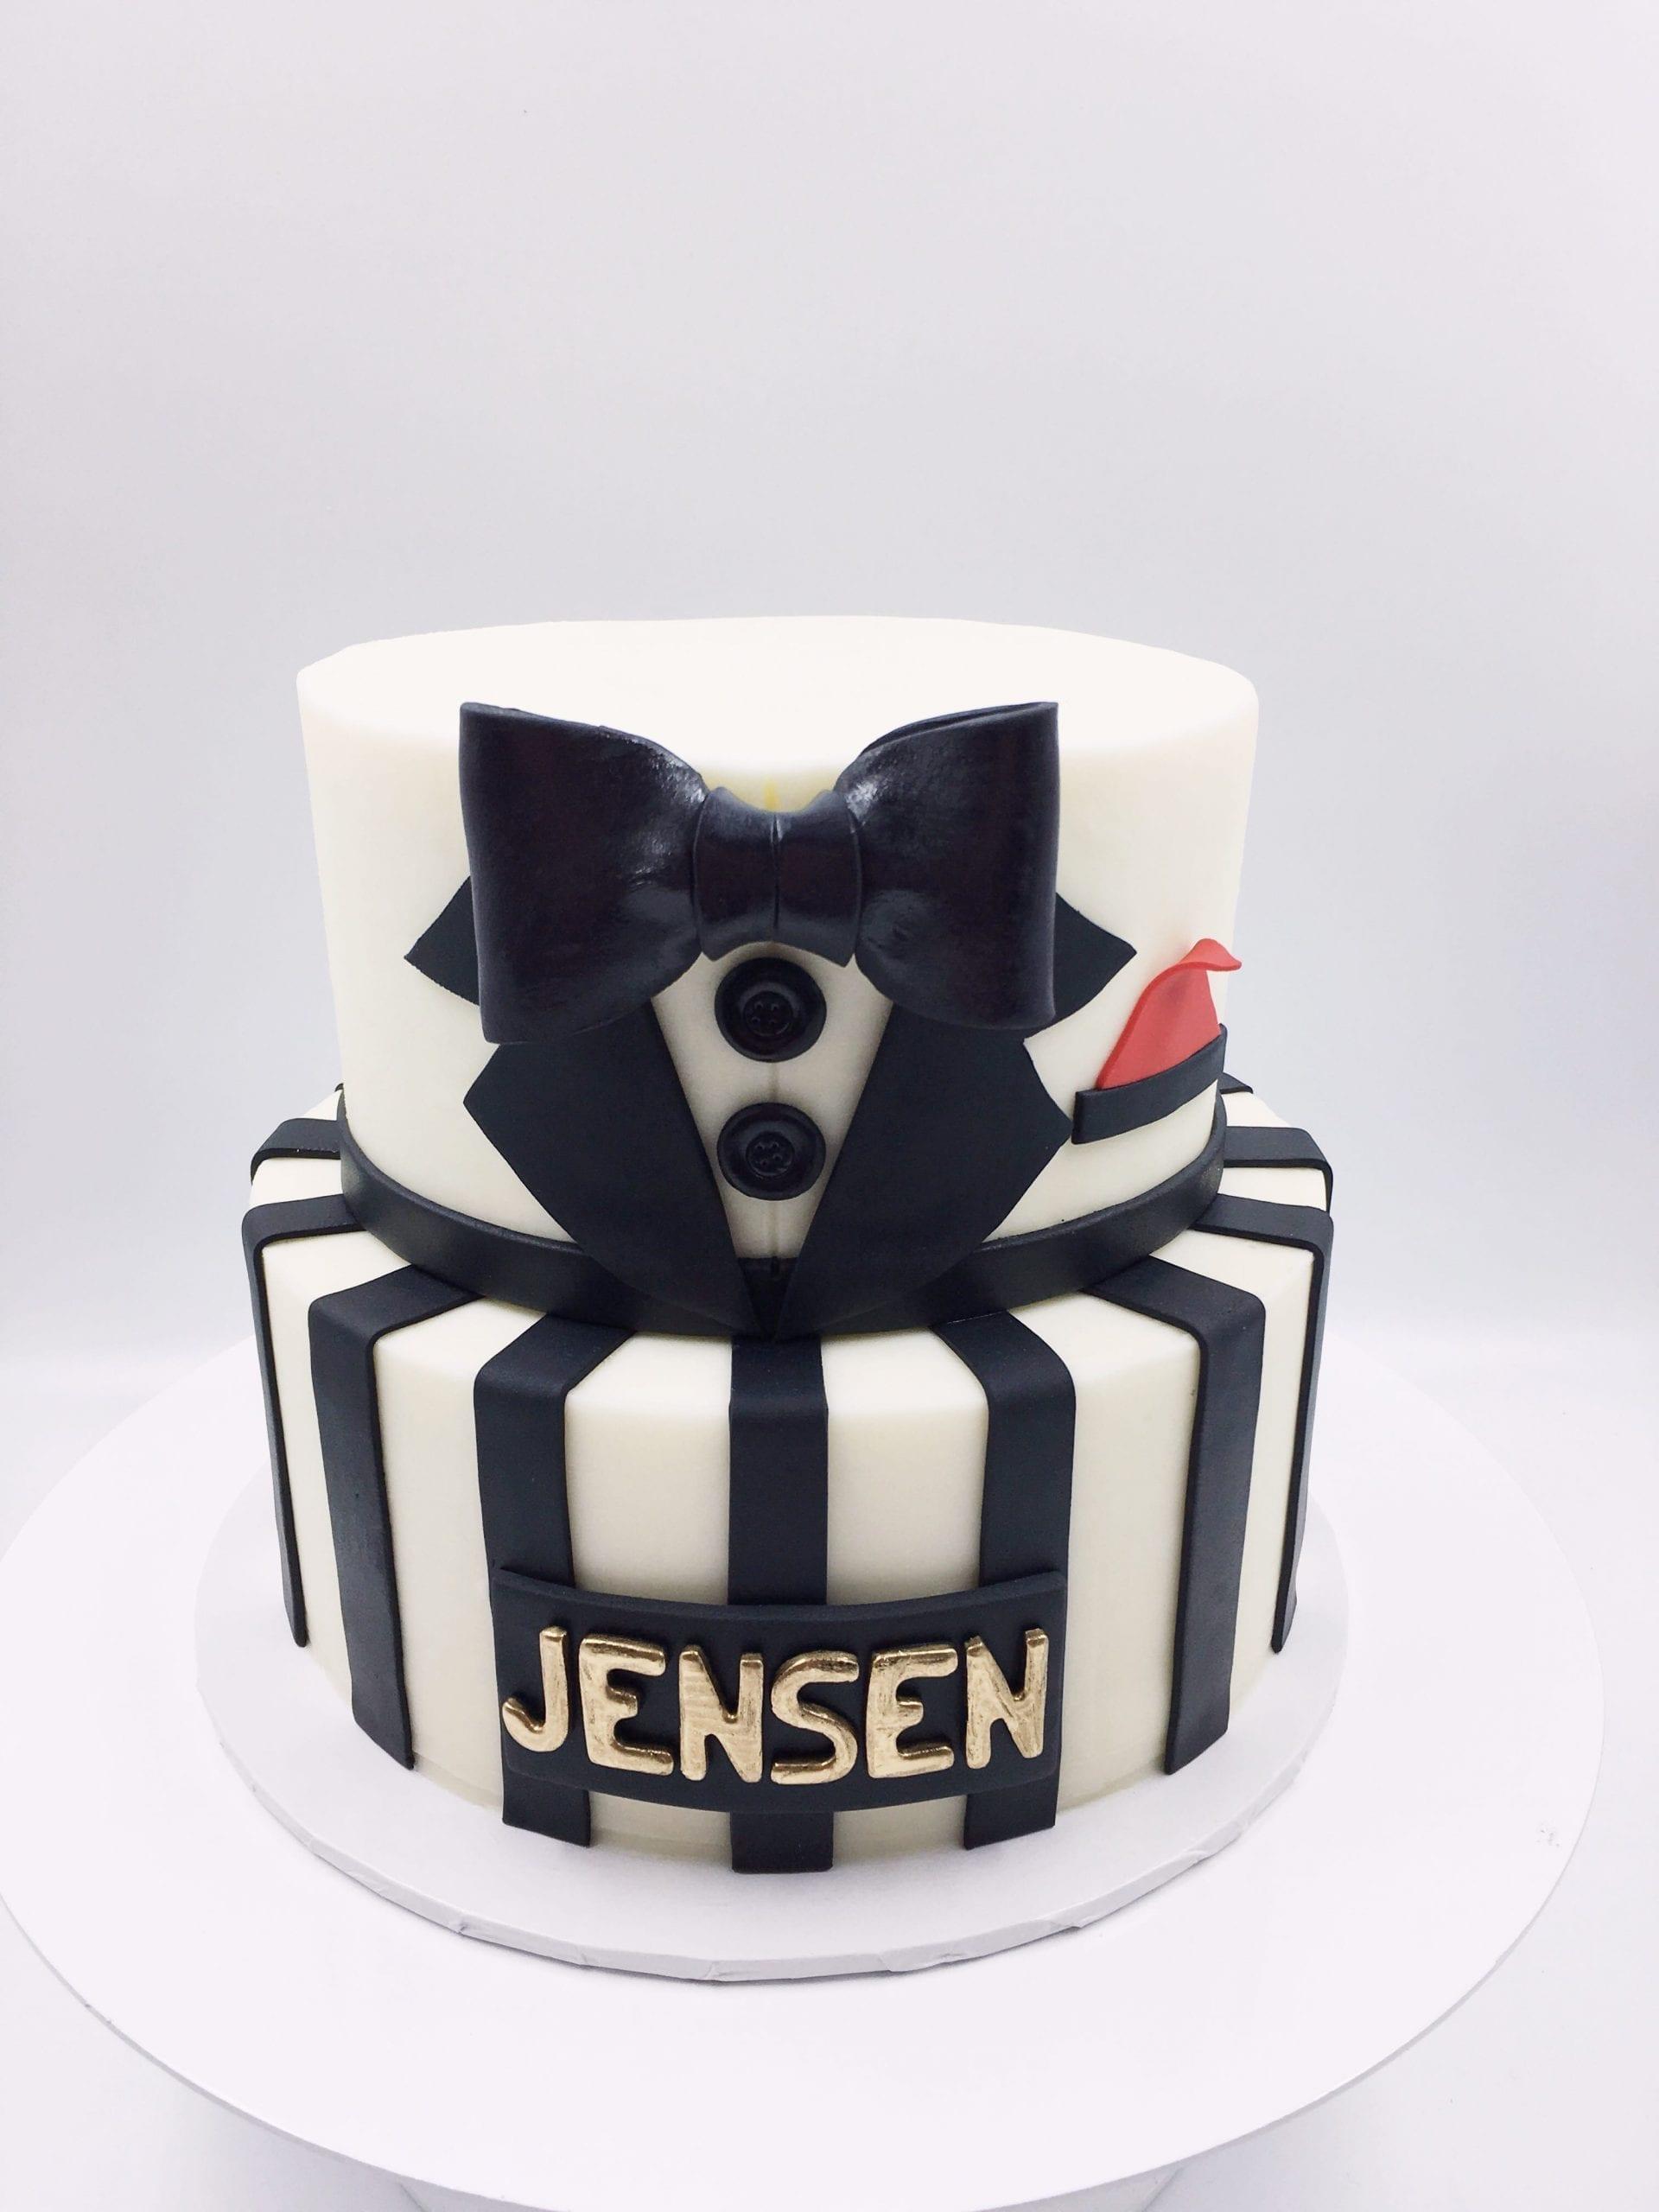 Tuxedo 2 Tier Cake | 3 Sweet Girls Cakery